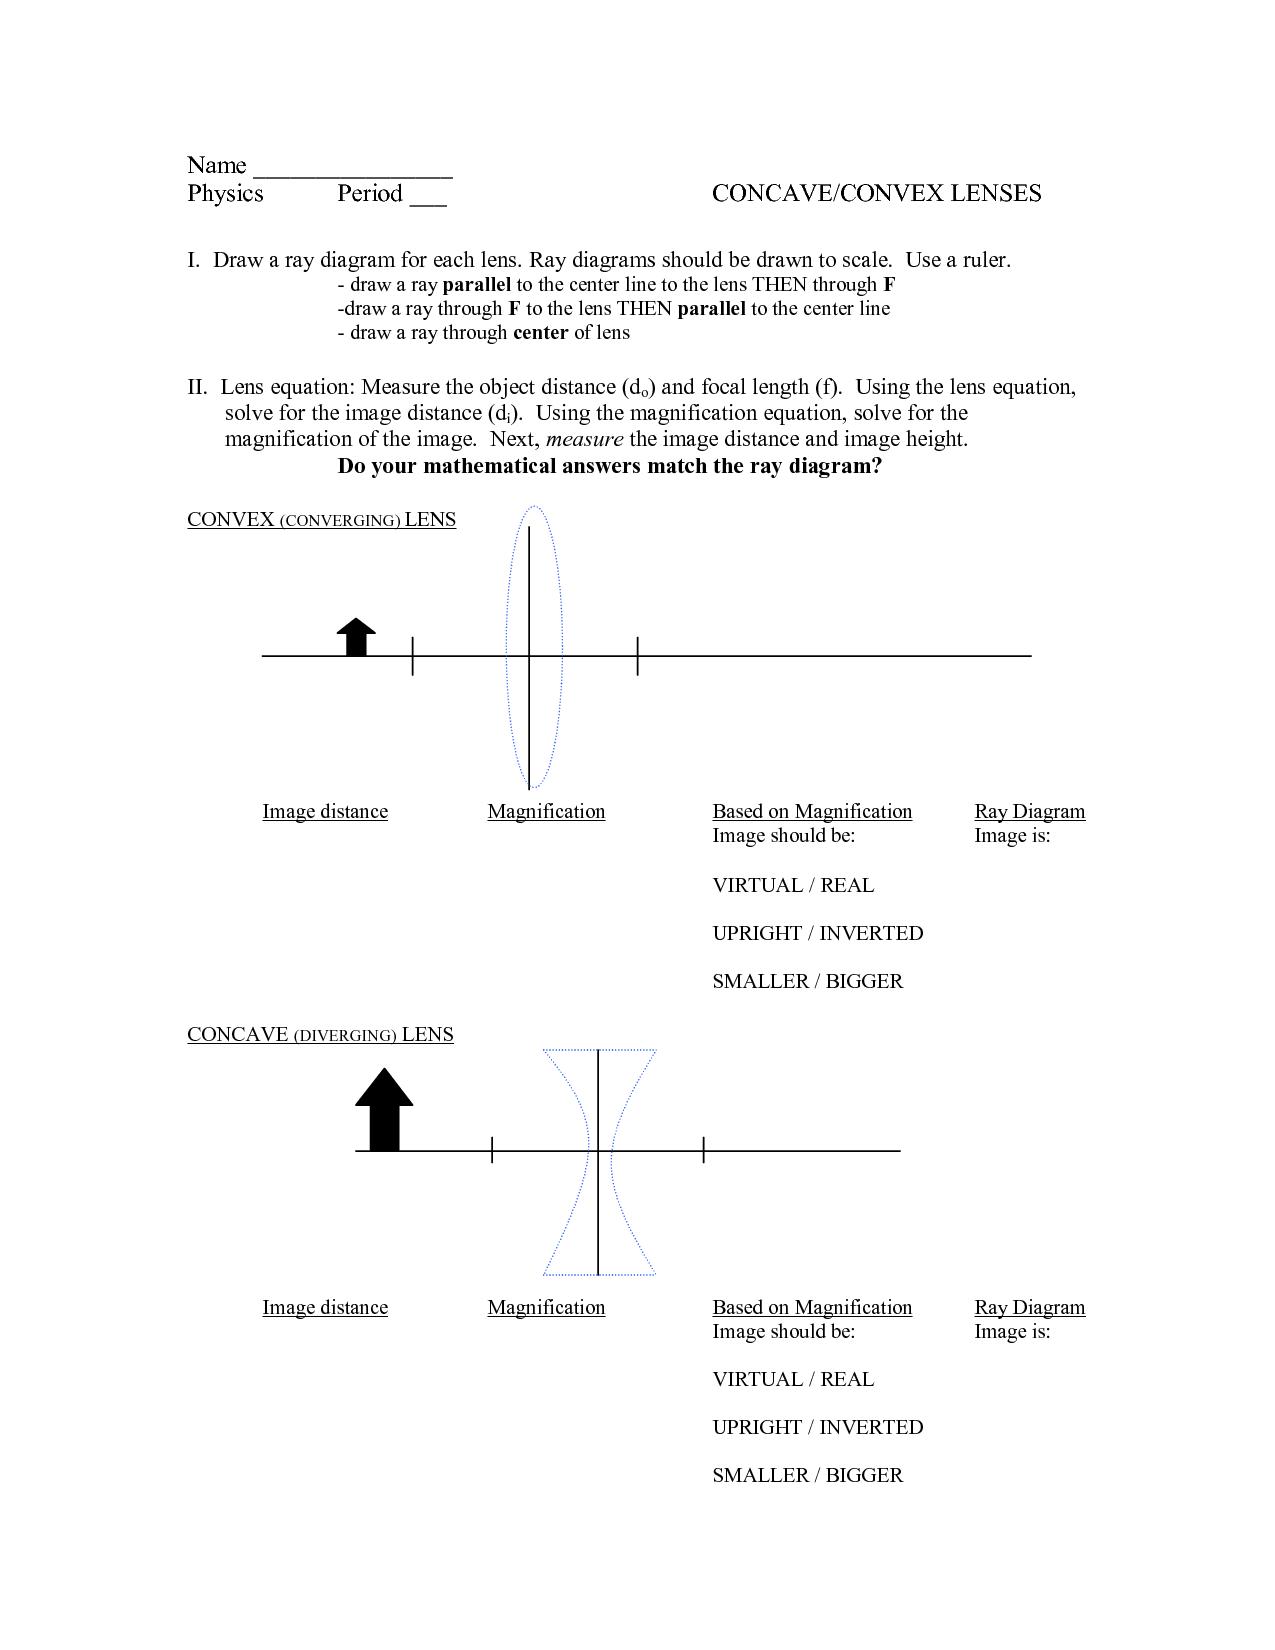 light ray diagram worksheets 95 honda civic engine 10 best images of convex lenses practice worksheet key